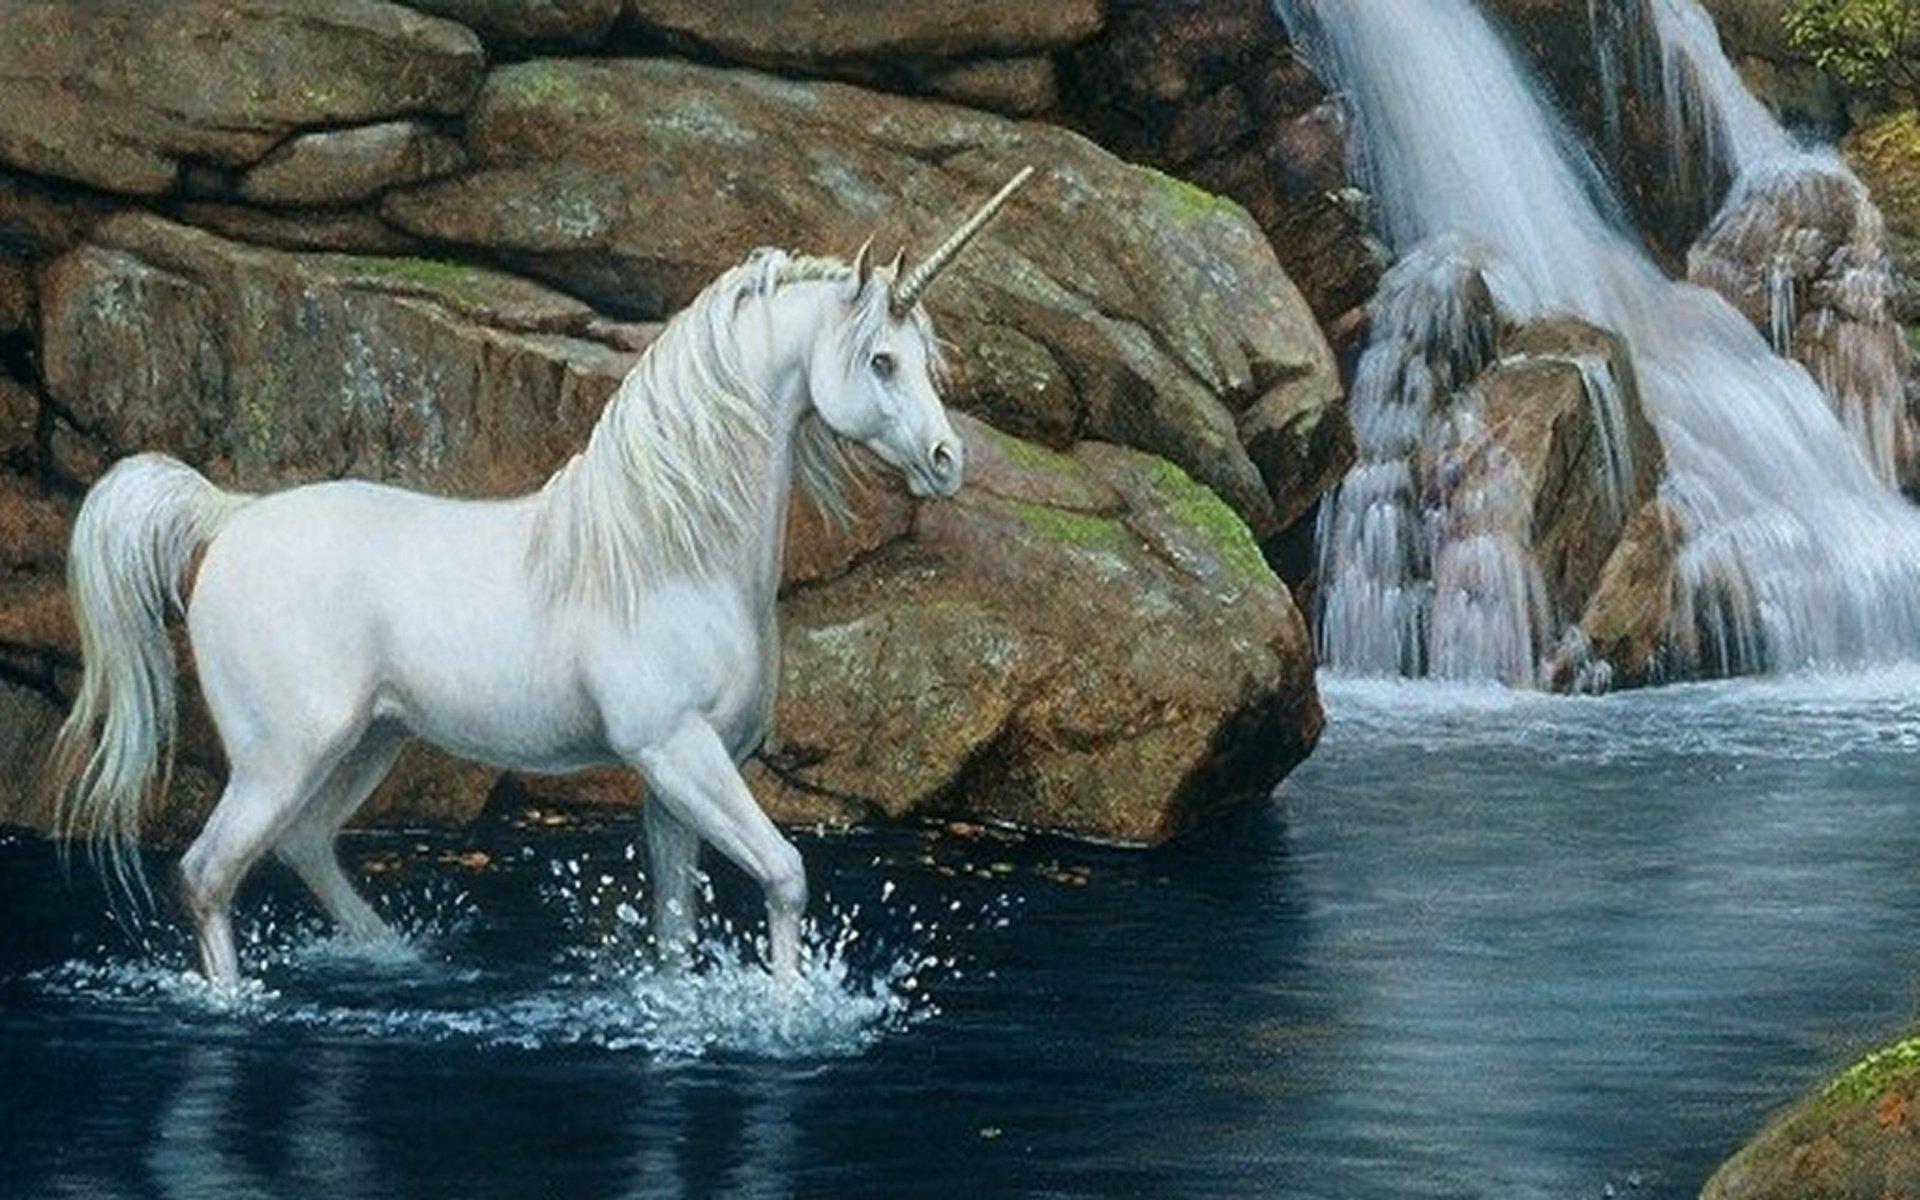 horse wallpaper hd 1080p Desktop Backgrounds for HD Wallpaper 1920x1200